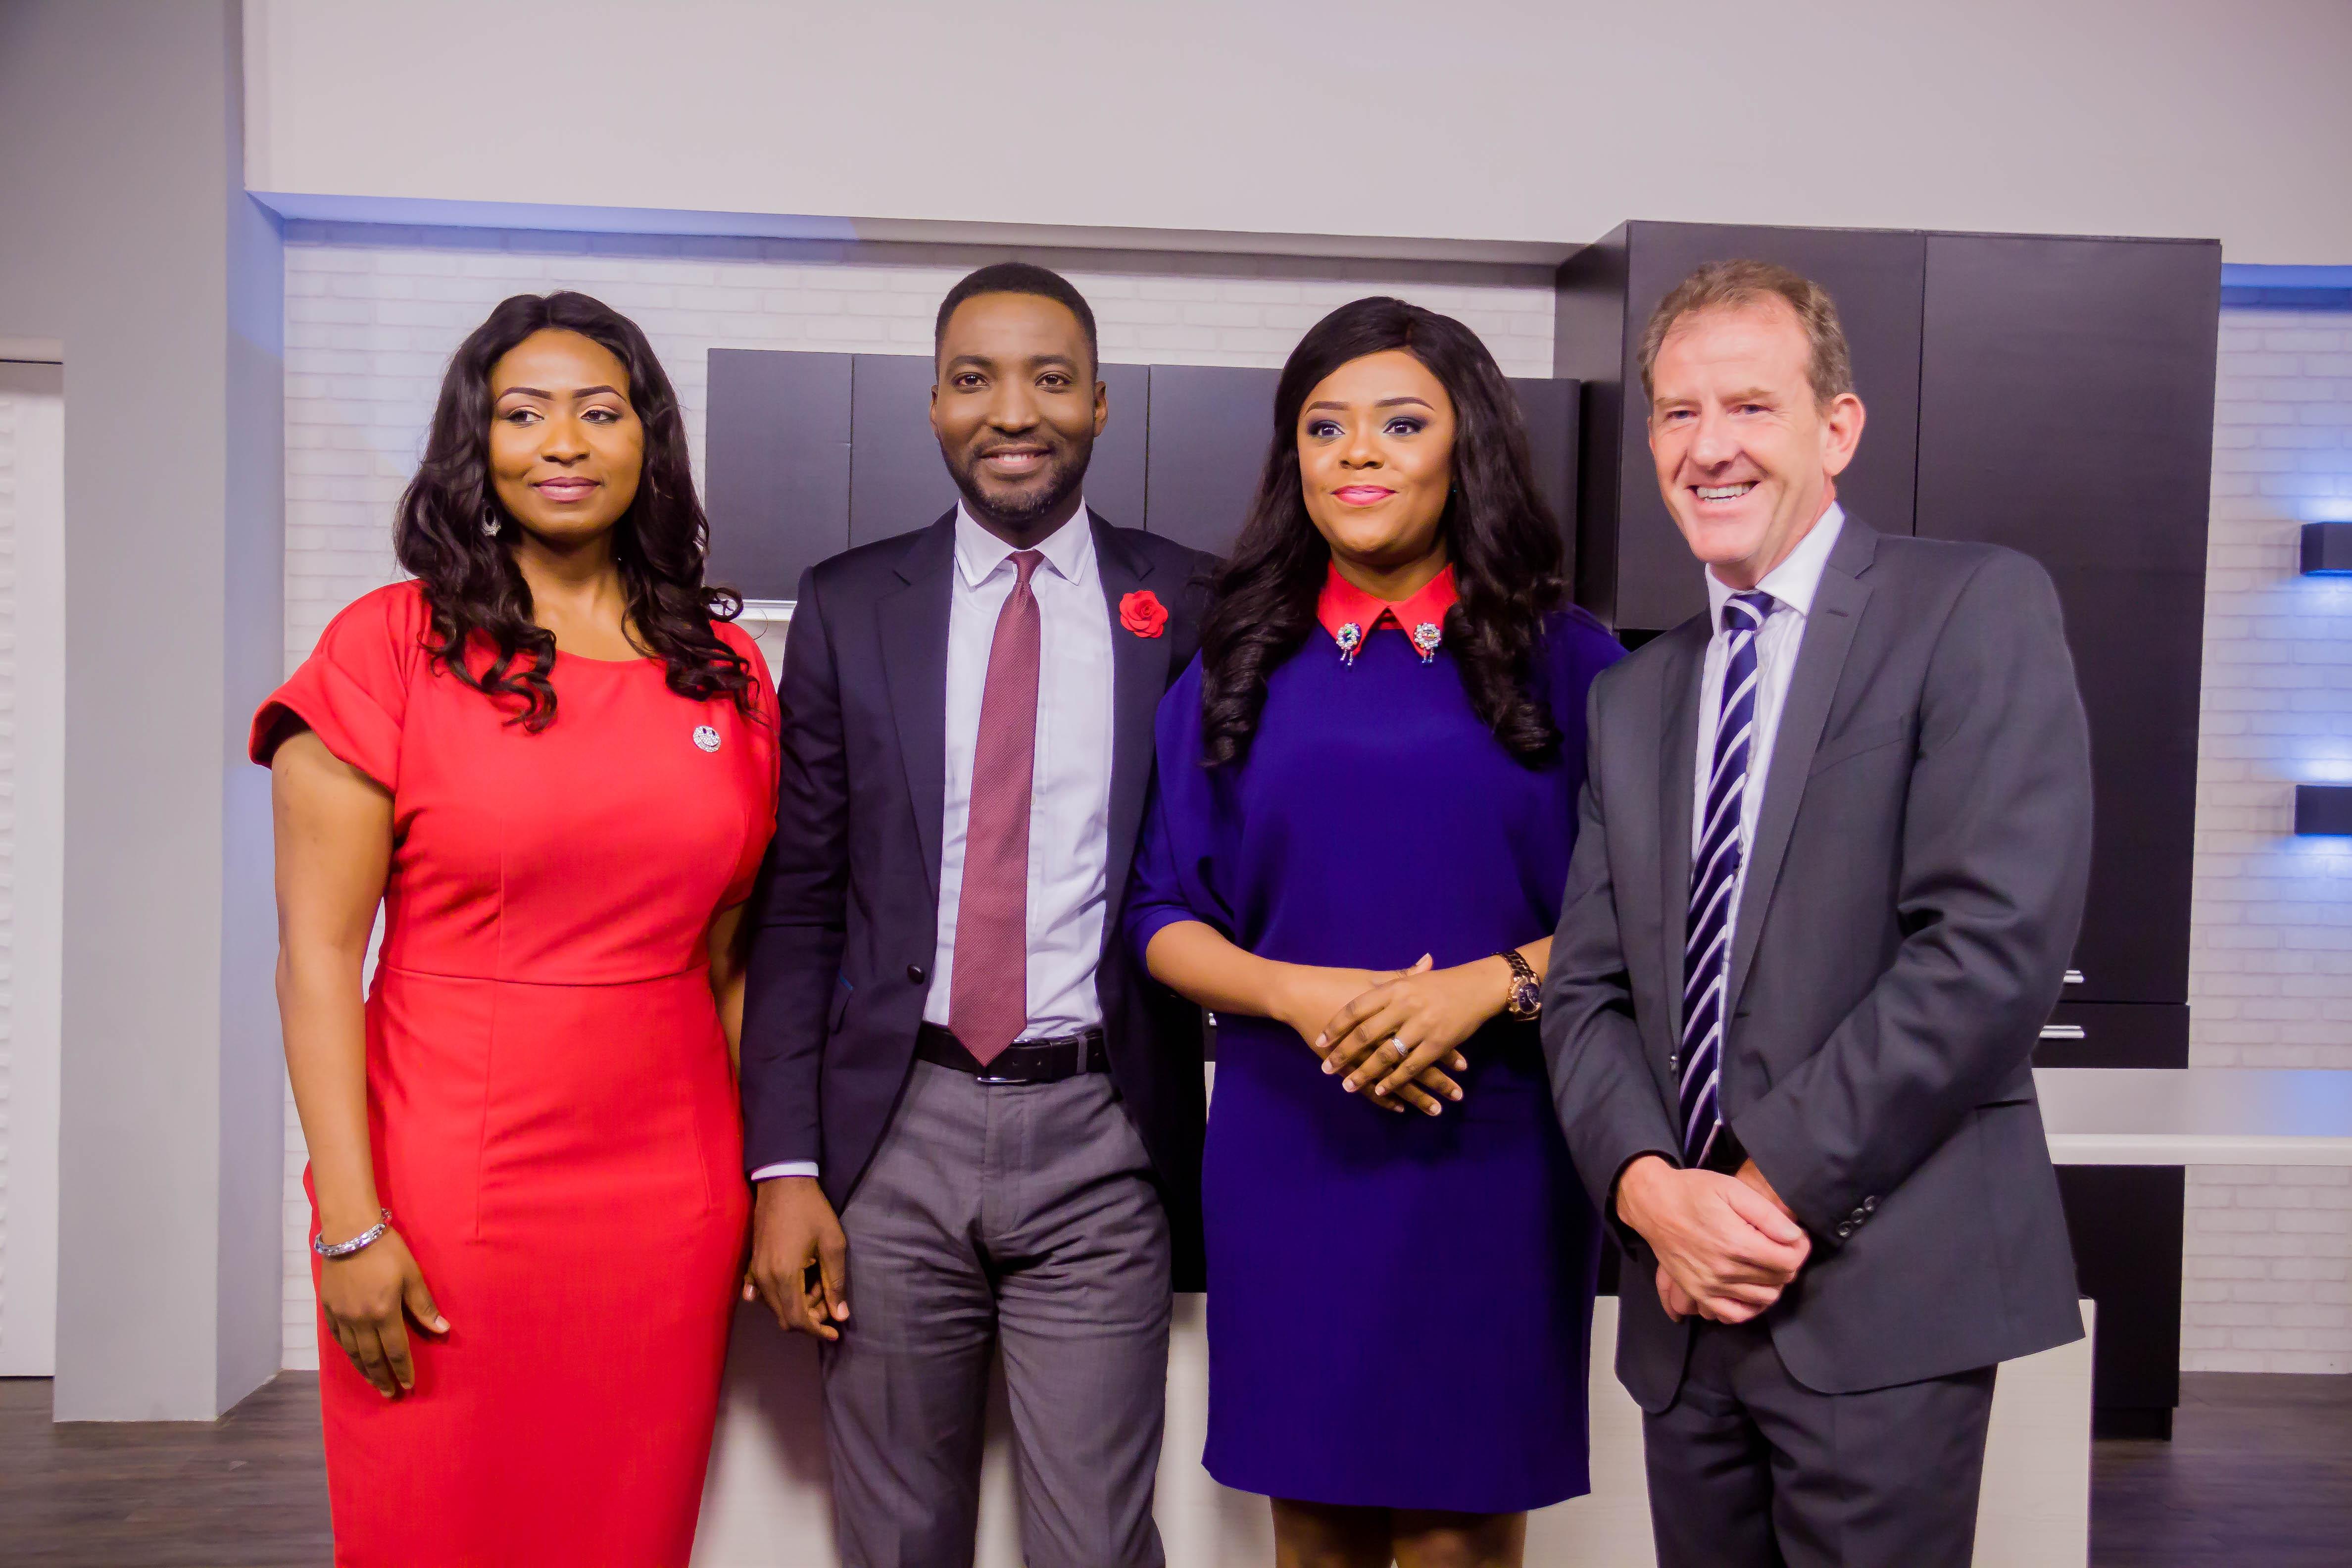 R-L: Andrew Hanlon (CEO, TVC); Titi Oyinsan & Yomi Owope (Presenters, WakeUpNigeria) and Morayo Afolabi-Brown (Deputy Director Programmes, TVC),